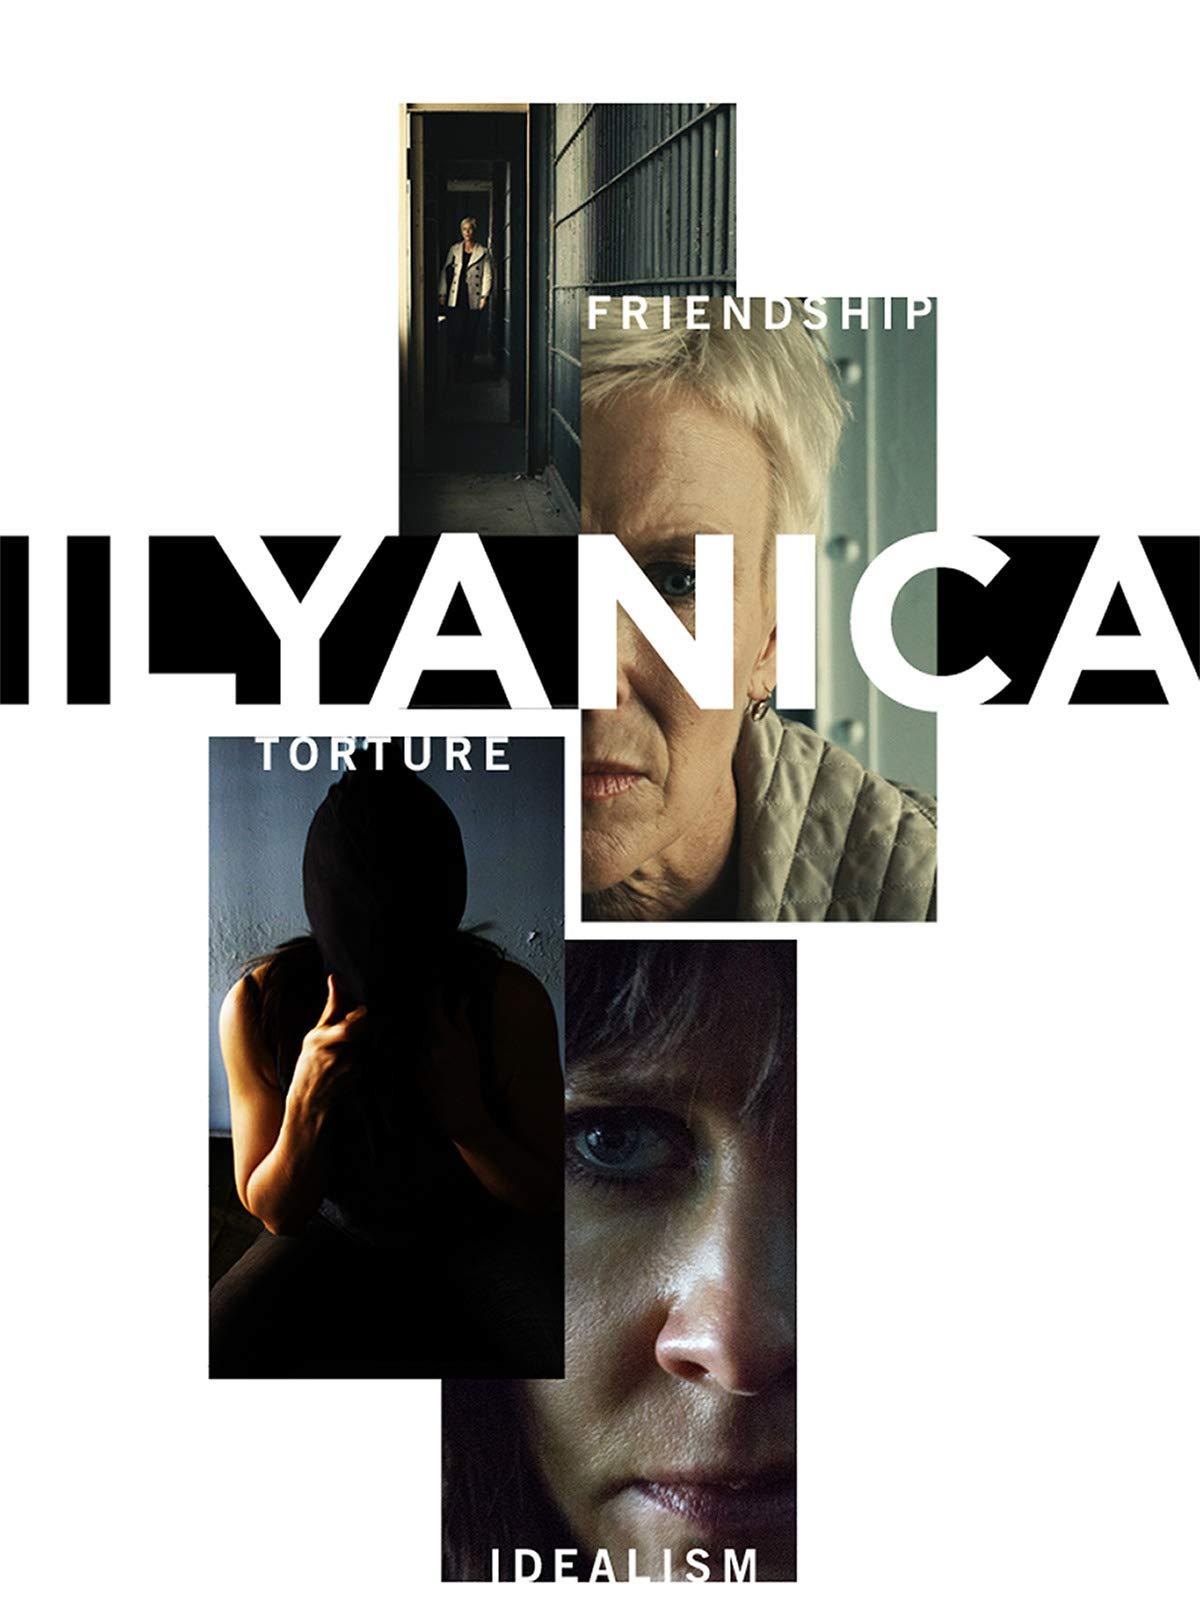 Ilyanica